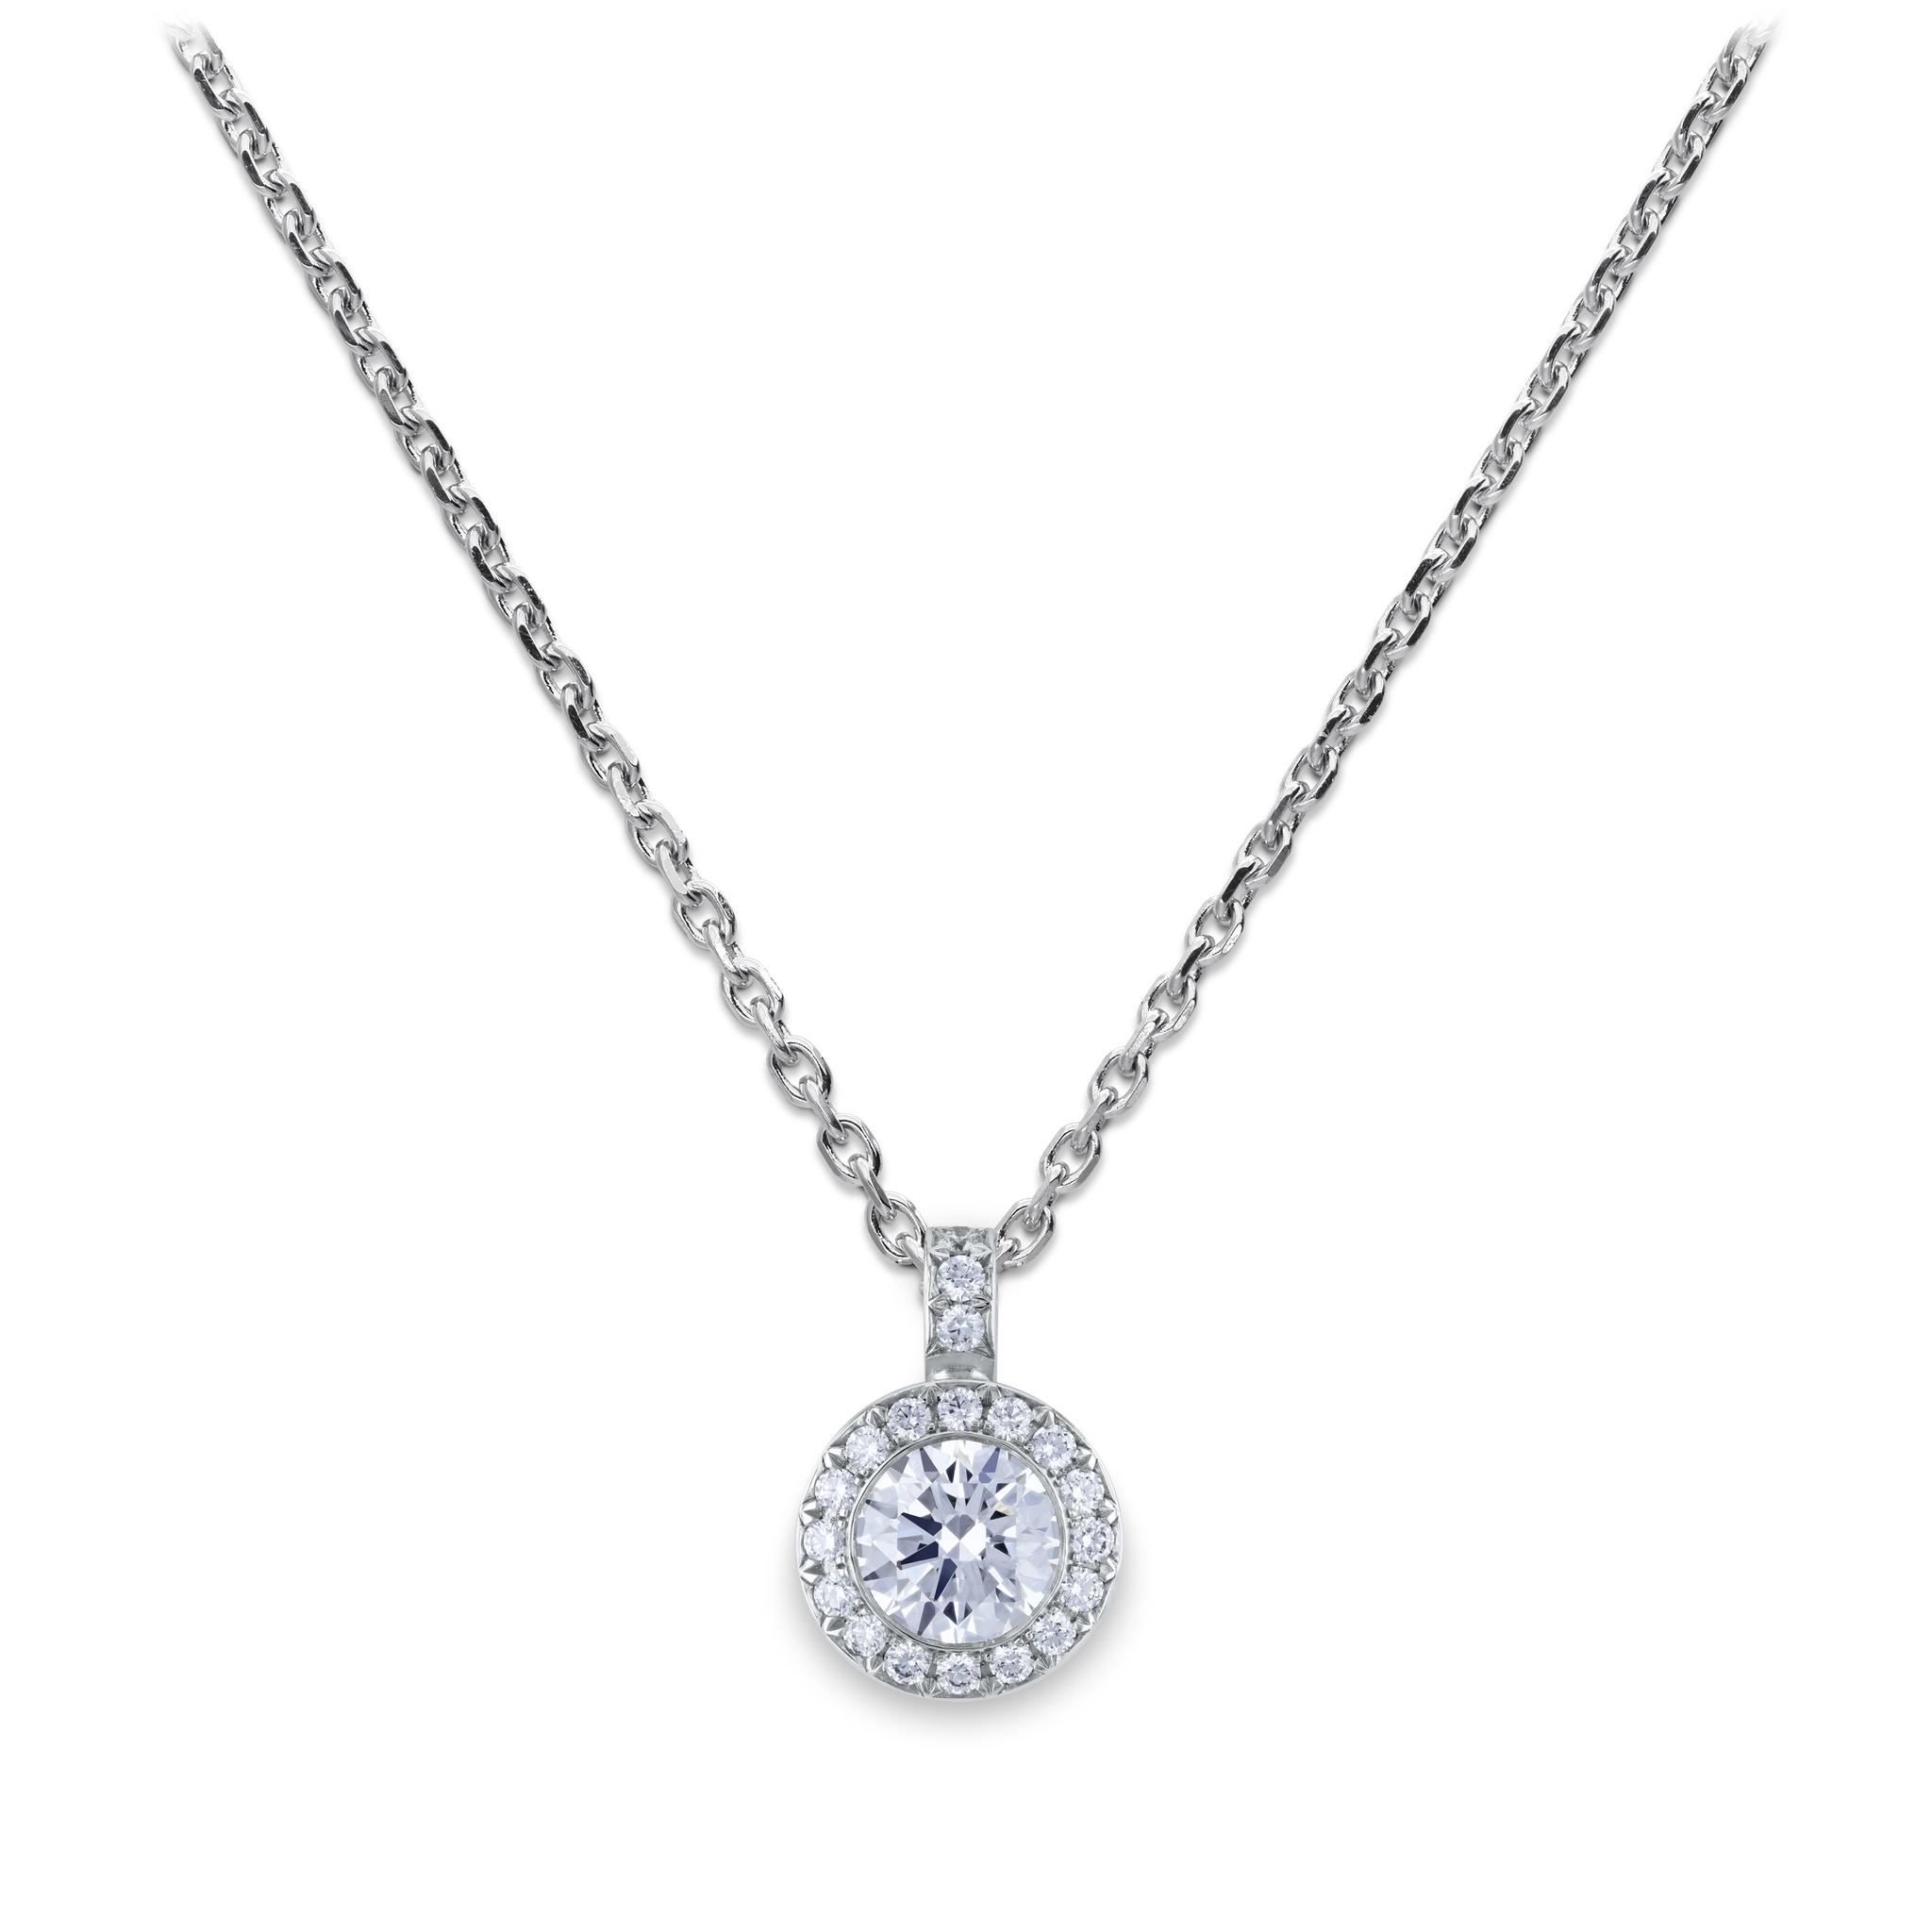 Necklace with diamond